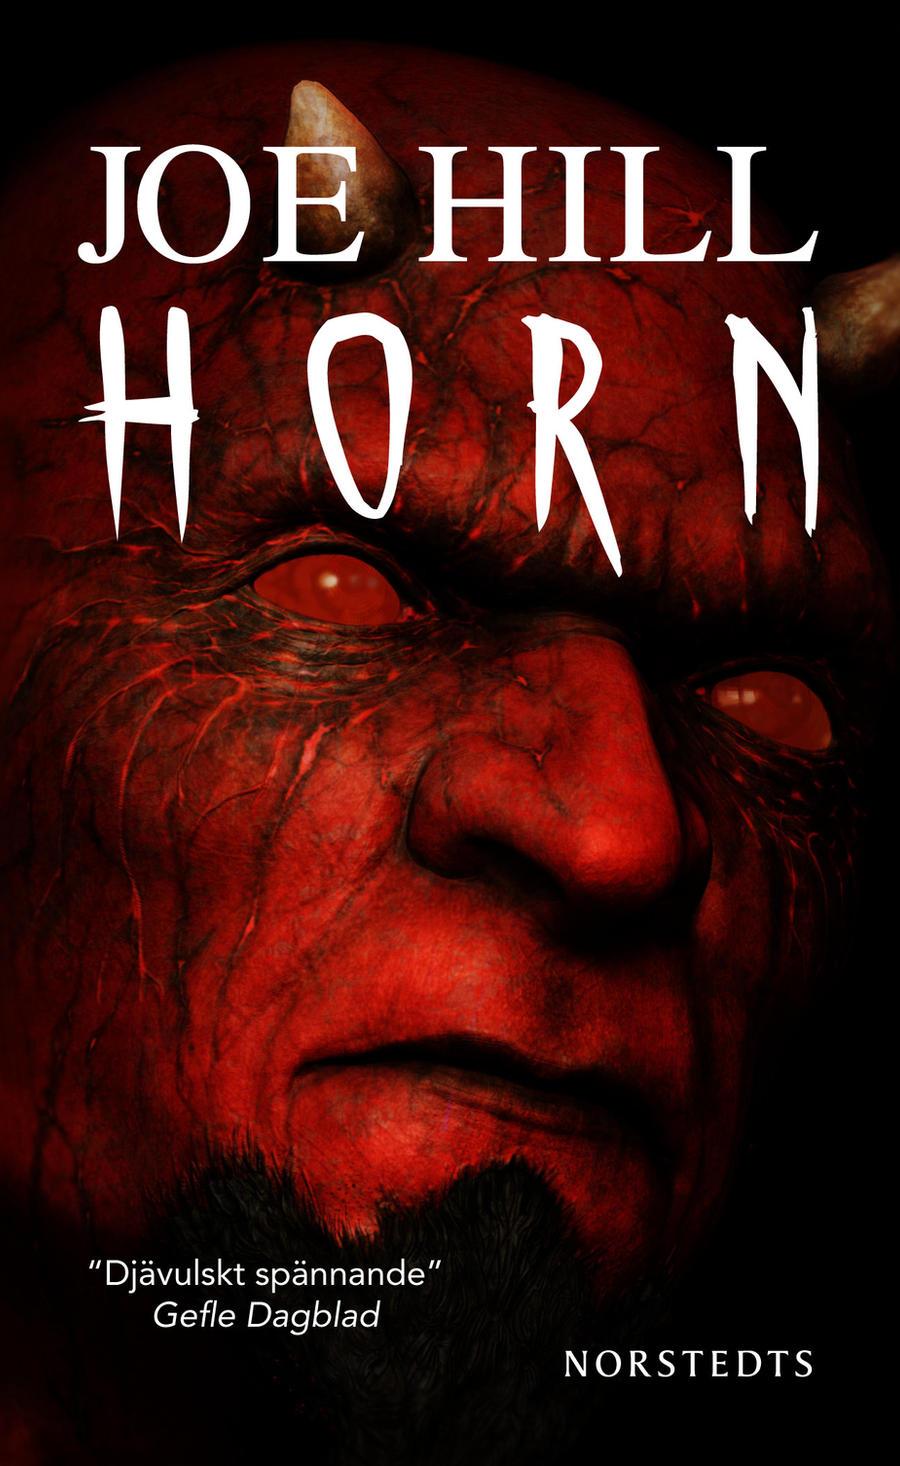 Joe Hill Horn by ColdHandLuke